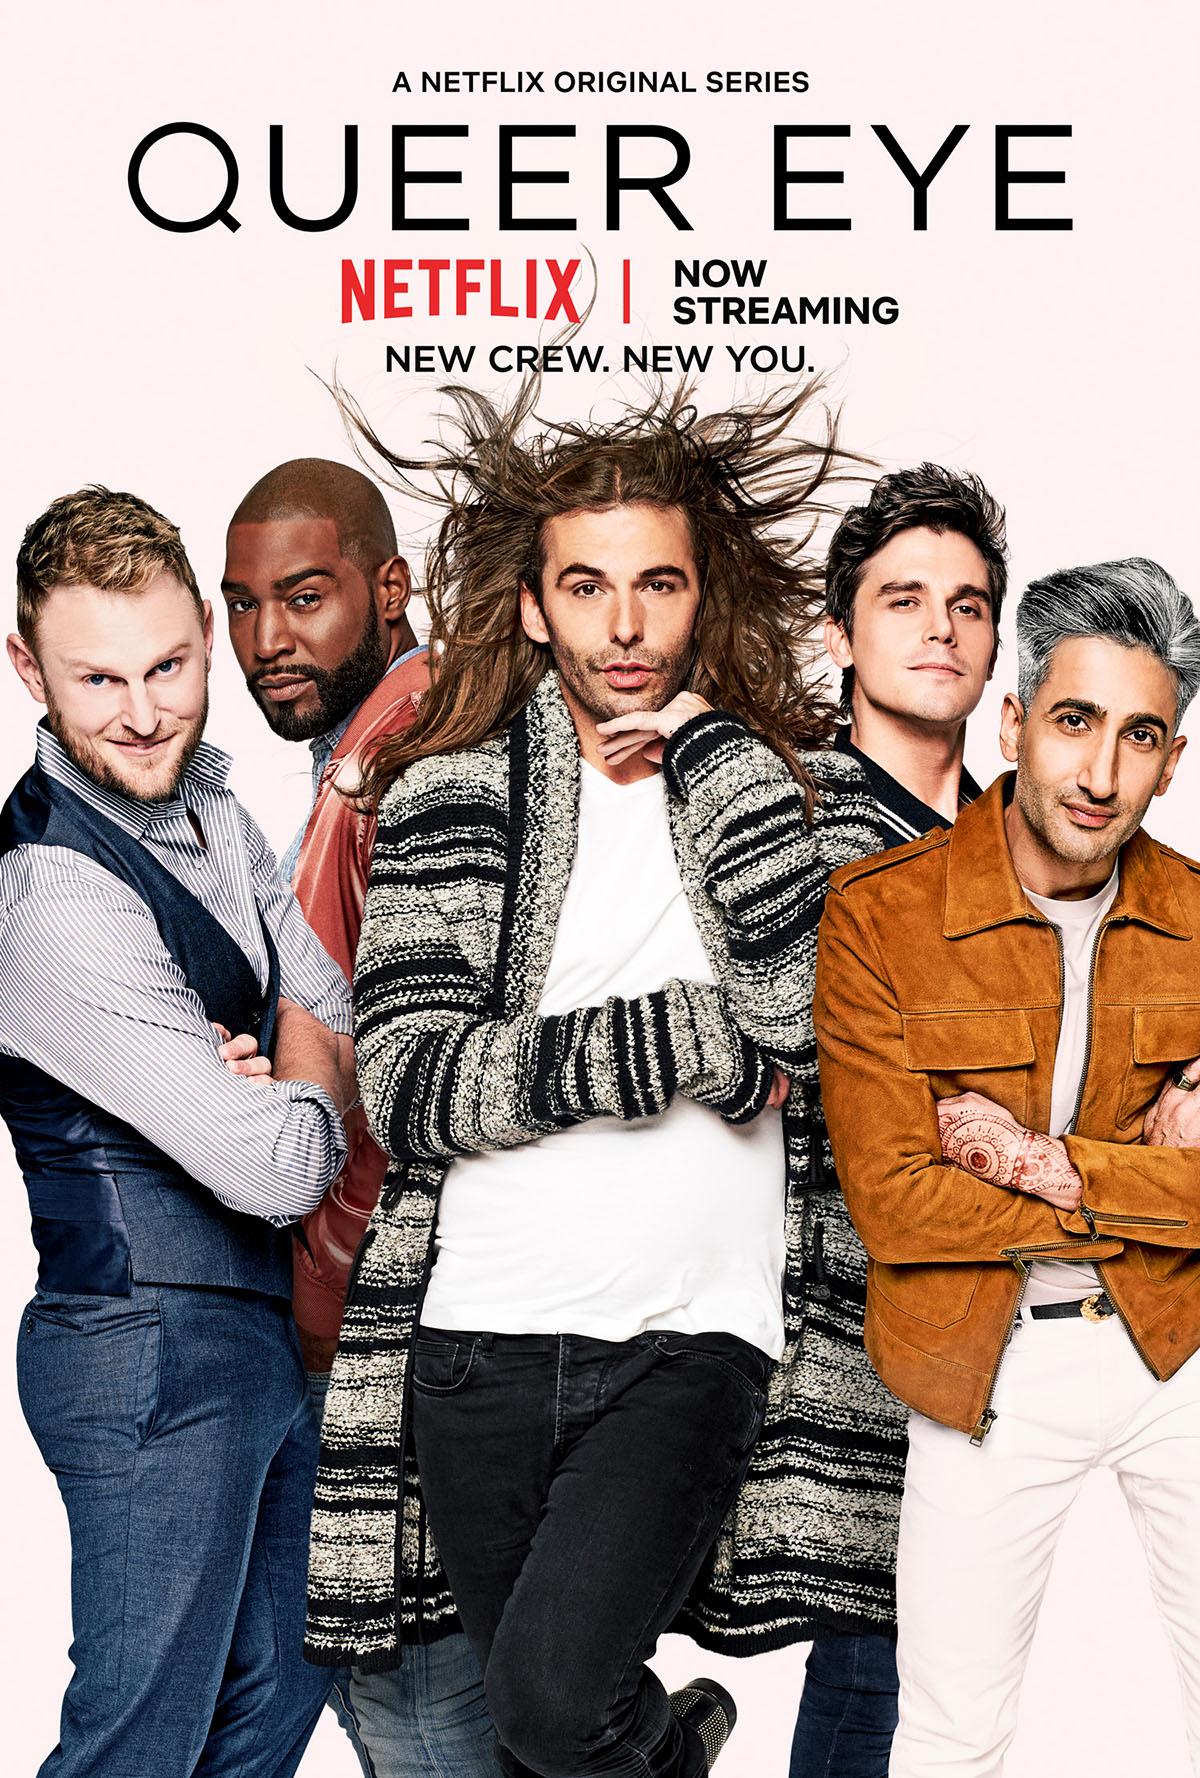 photo : Netflix Netflixオリジナルシリーズ「クィア・アイ」シーズン1〜5 Netflixにて独占配信中